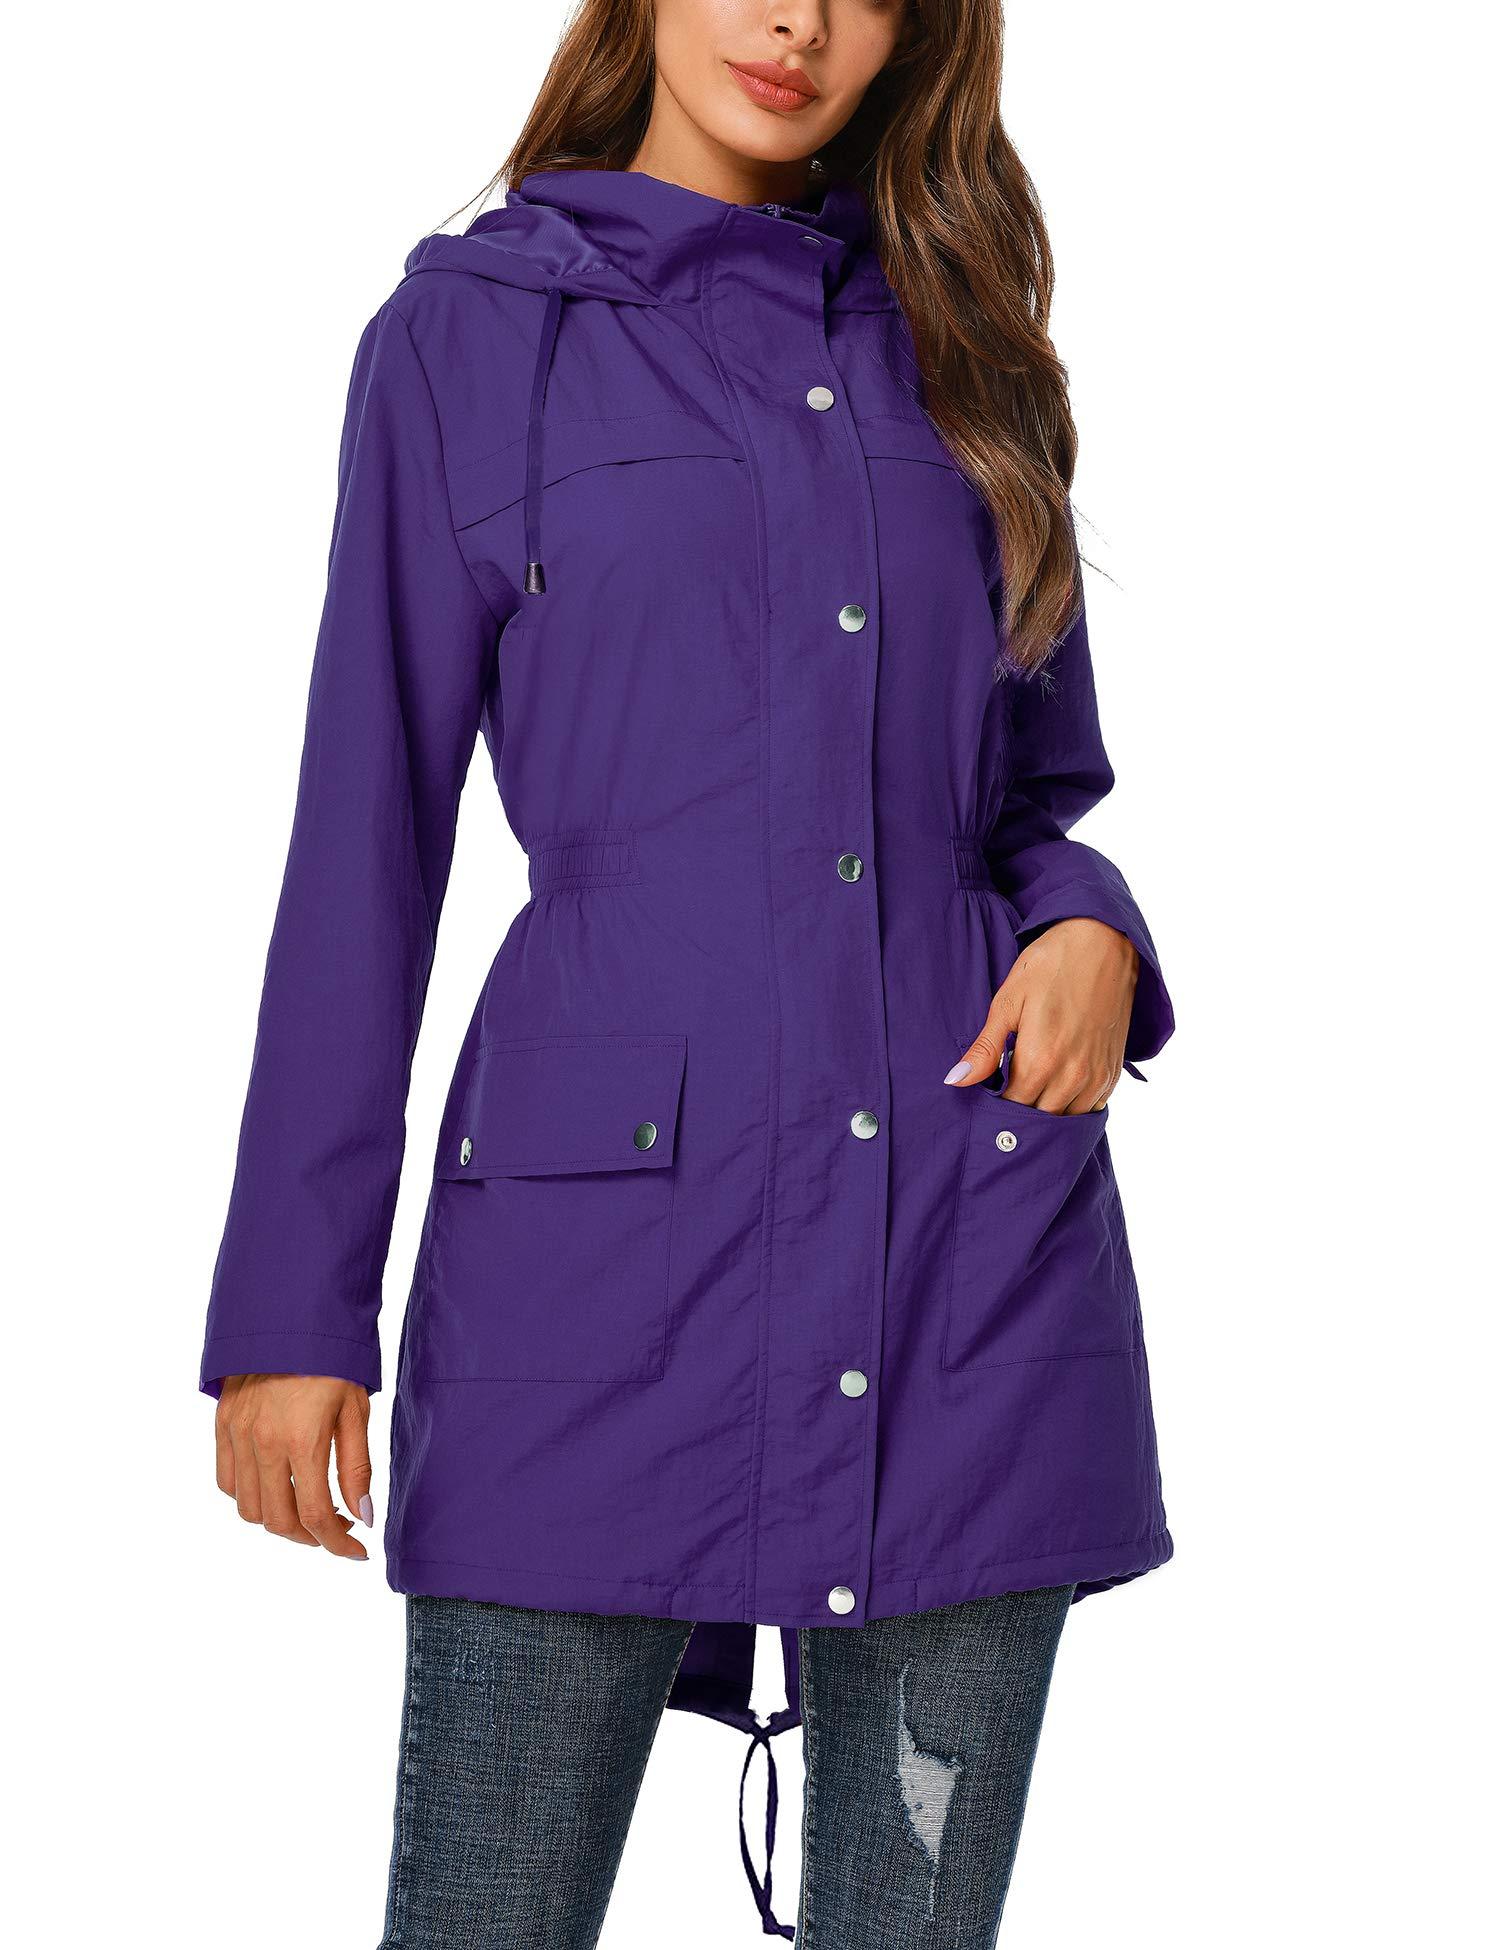 Womens Outerwear Lightweight Hooded Waterproof Active Outdoor Rain Jacket Purple,XXL by UUANG